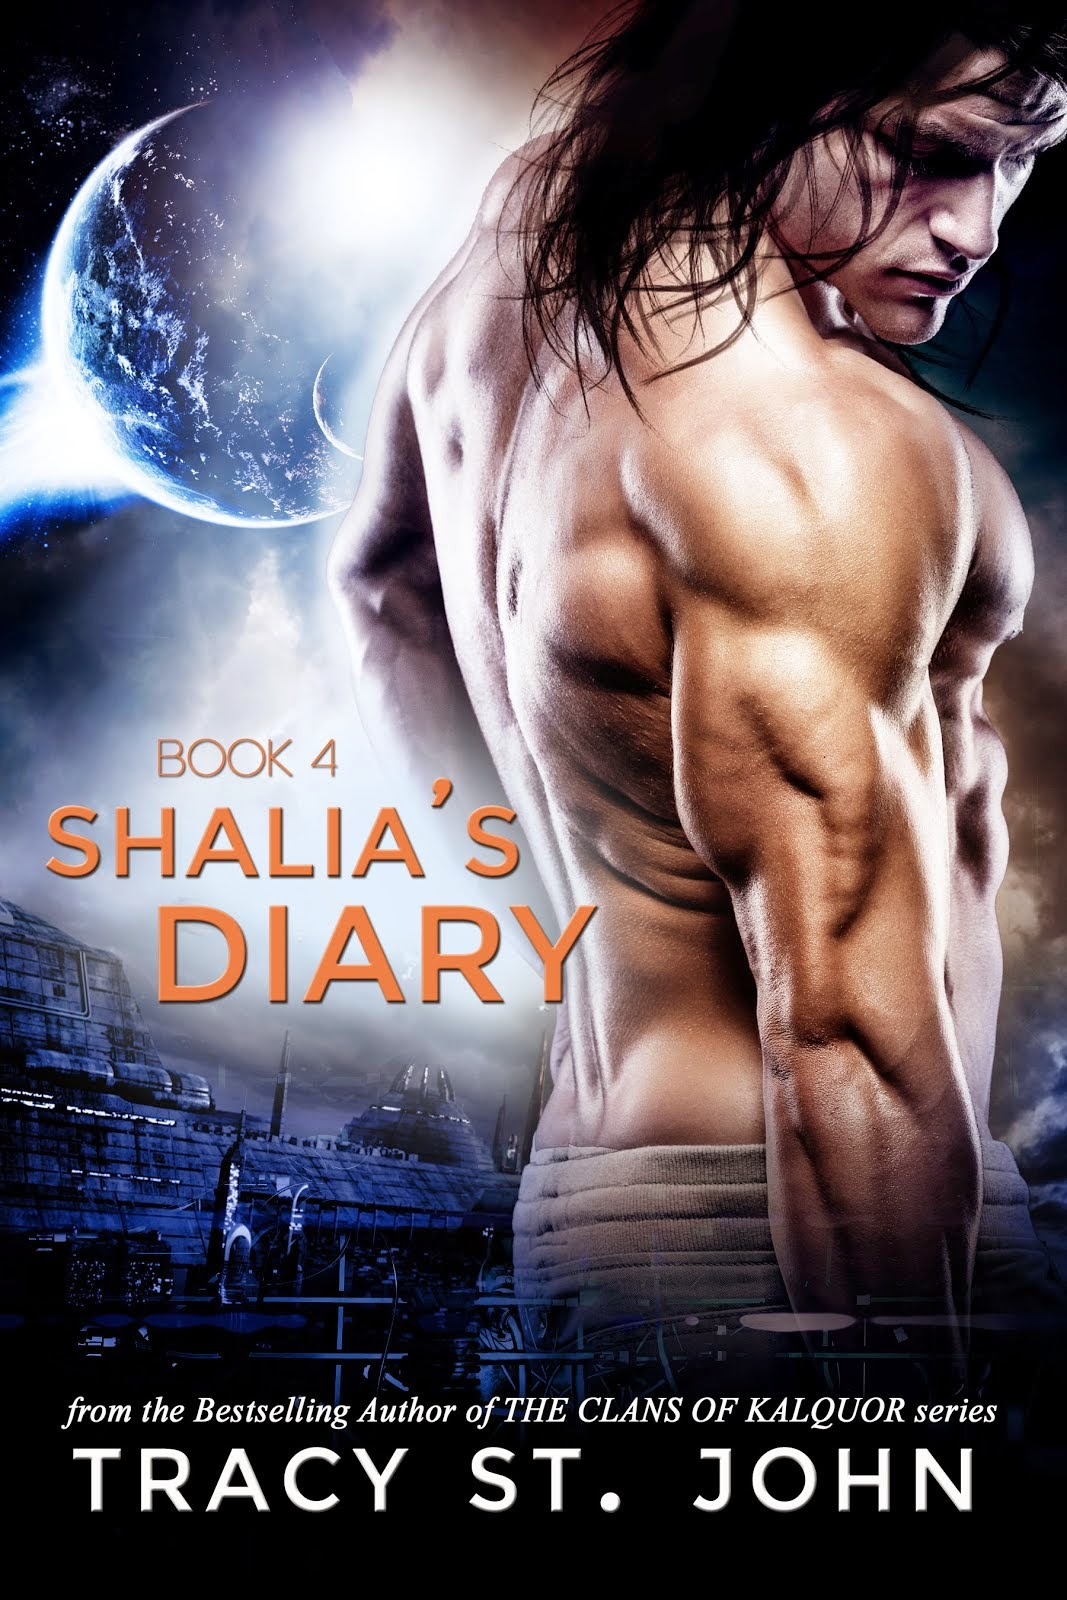 Shalia's Diary Book 4